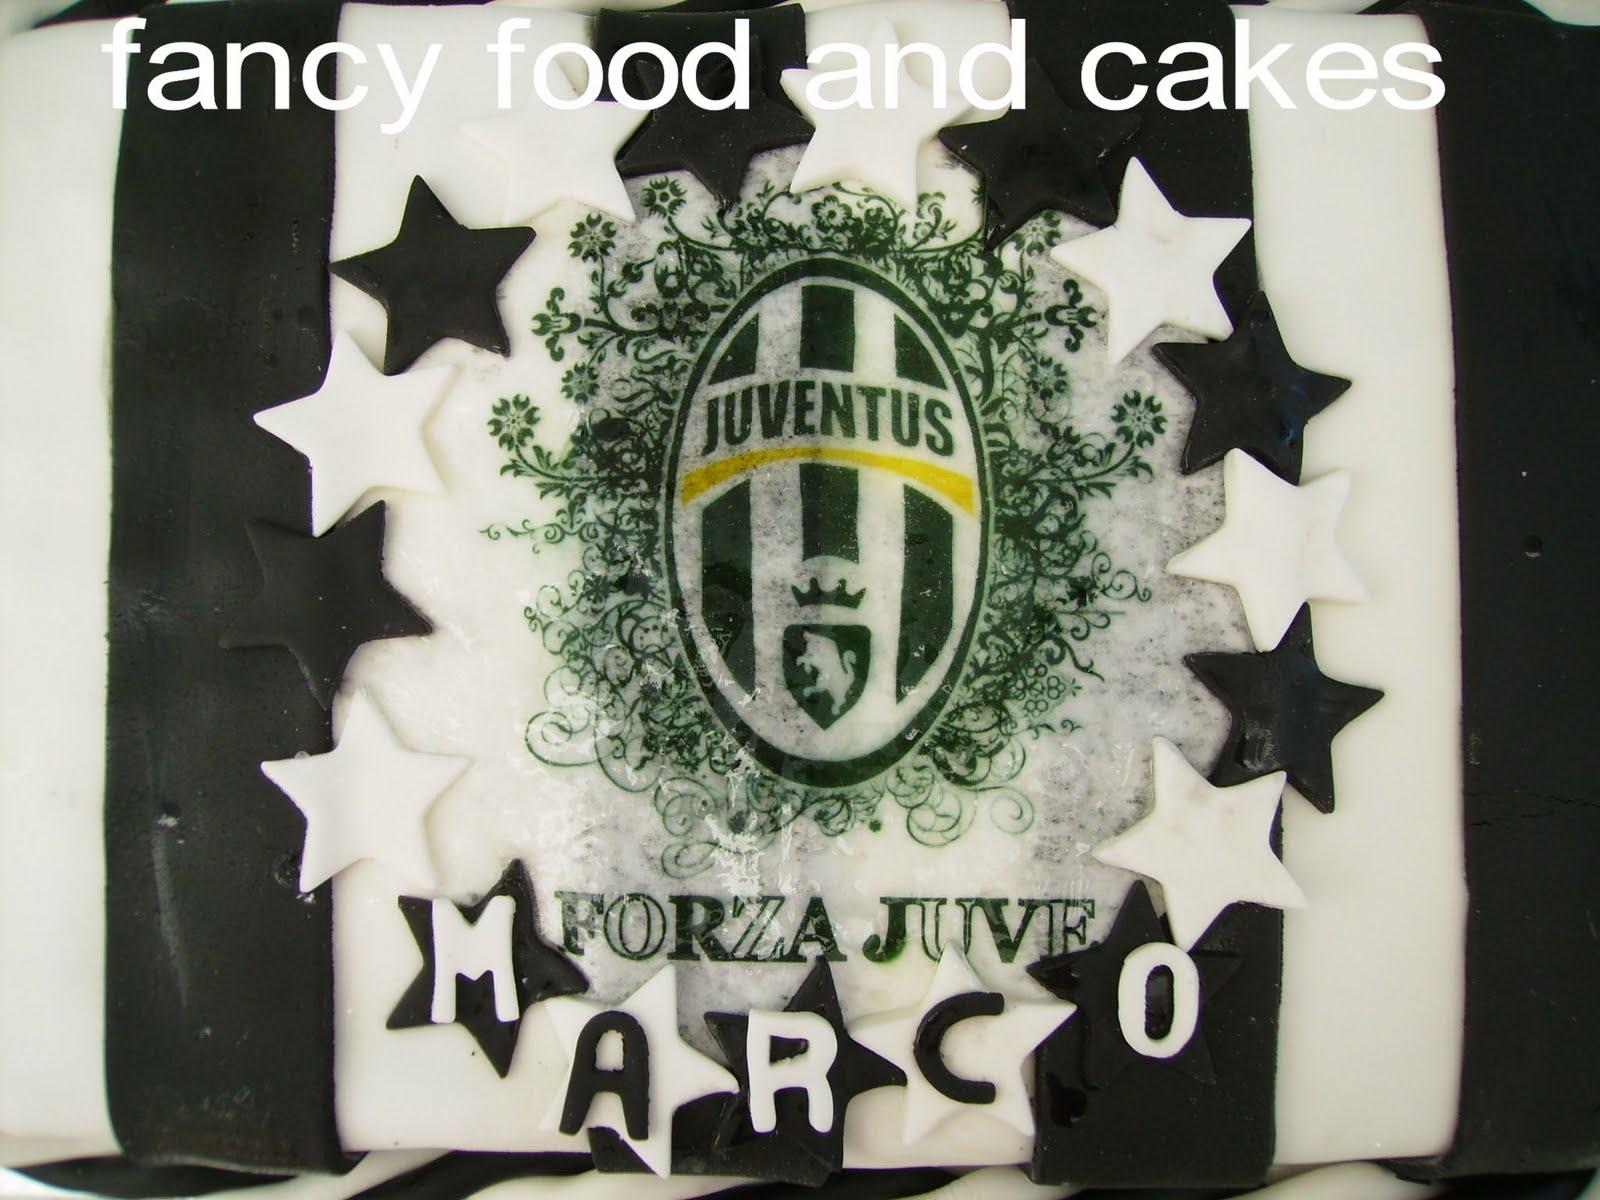 decorazioni torta juventus: sweet fireblue: ♥e finalmente la ... - Decorazioni Torte Juventus